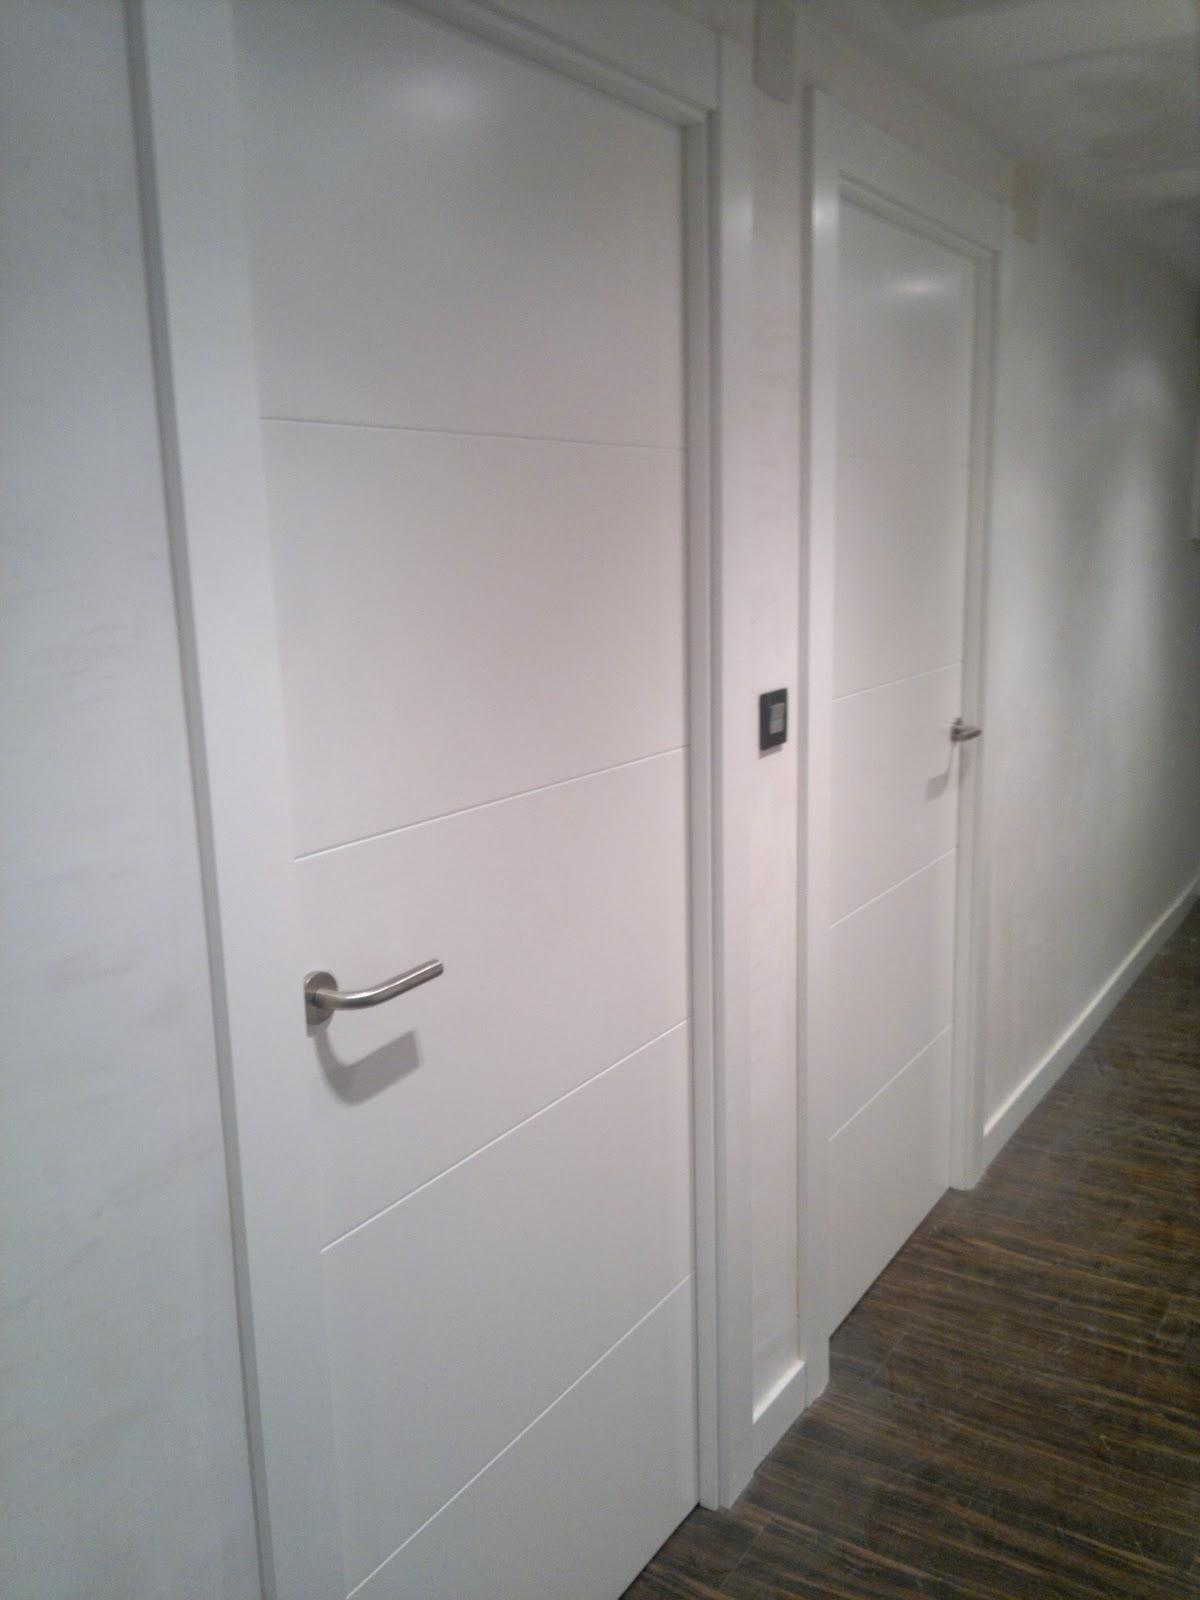 Ebanisteria carpinteria manuel perez zaragoza puertas lacadas en blanco zaragoza - Puertas en blanco ...